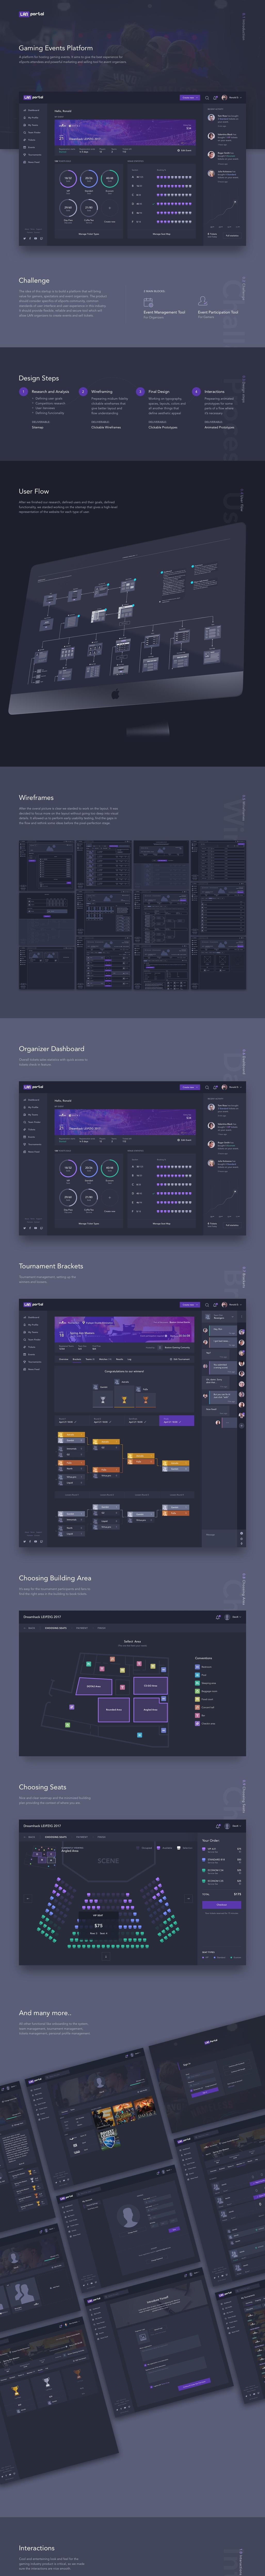 dashboard Seatmap UI ux Data analytics chart Gaming portal Booking